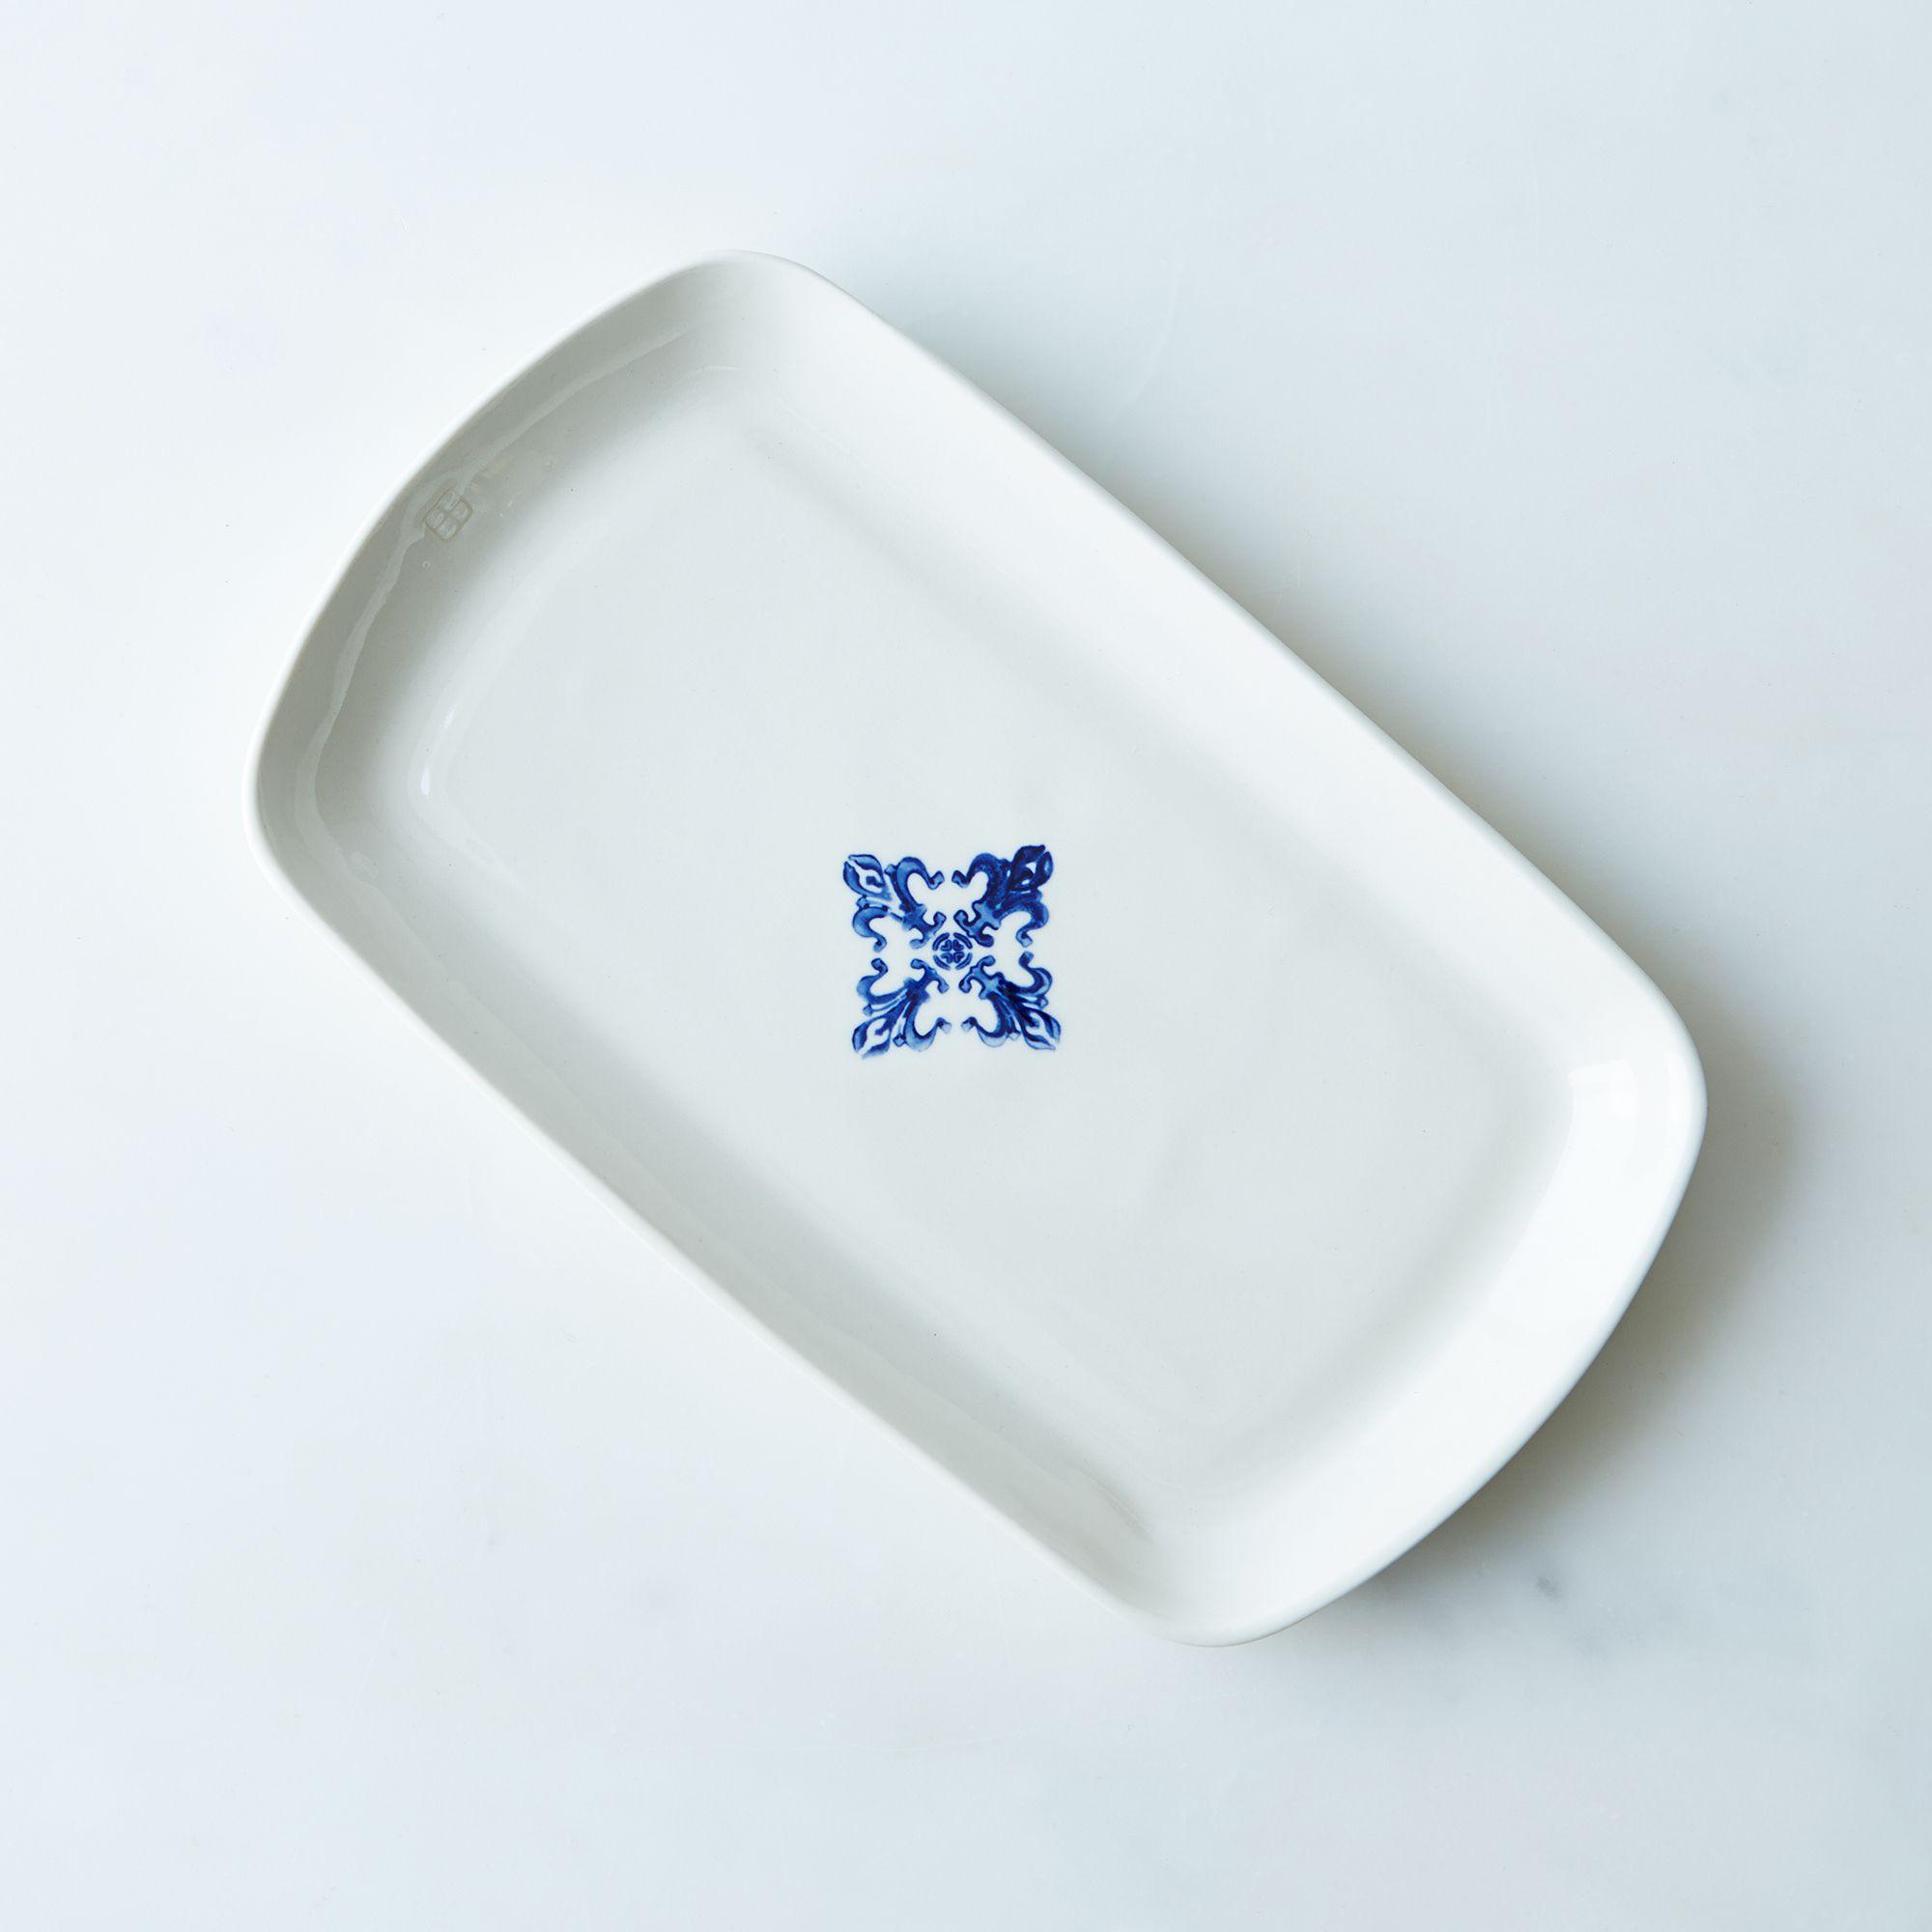 4947f848 a0f6 11e5 a190 0ef7535729df  arte manufacture serving platter blue provisions mark weinberg 15 08 14 0836 silo